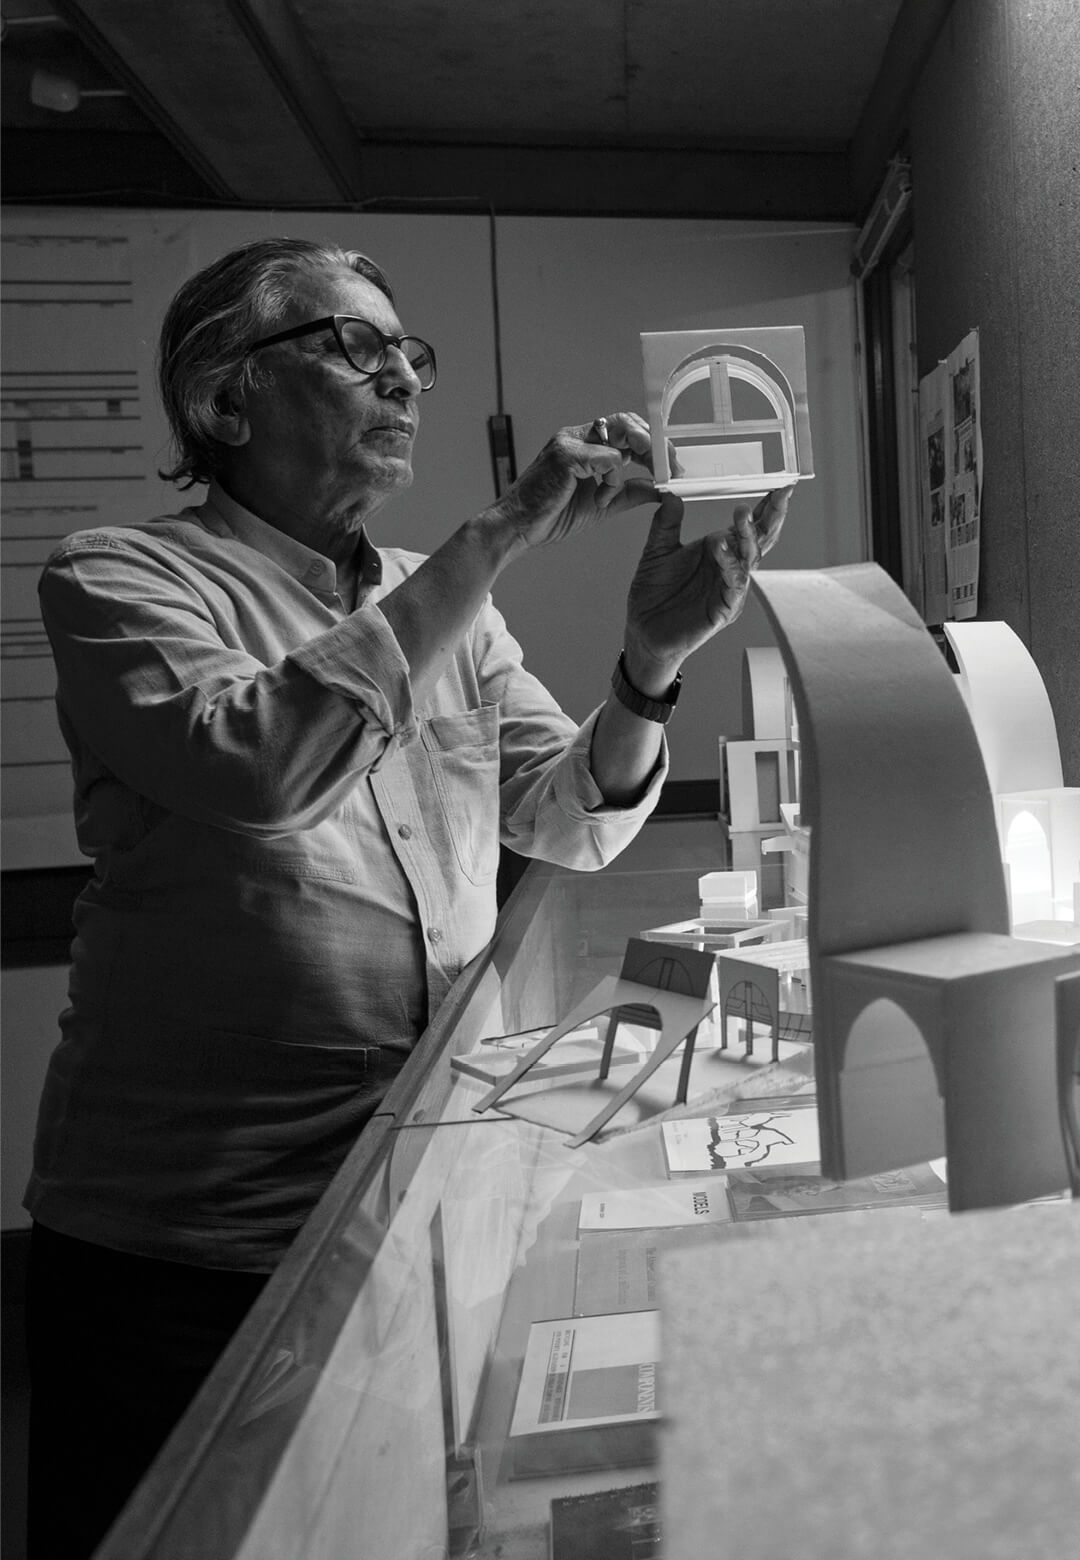 Pritzker Prize laureate and Indian architect Balkrishna Doshi | BV Doshi | Vastu Shilpa Foundation | STIRworld